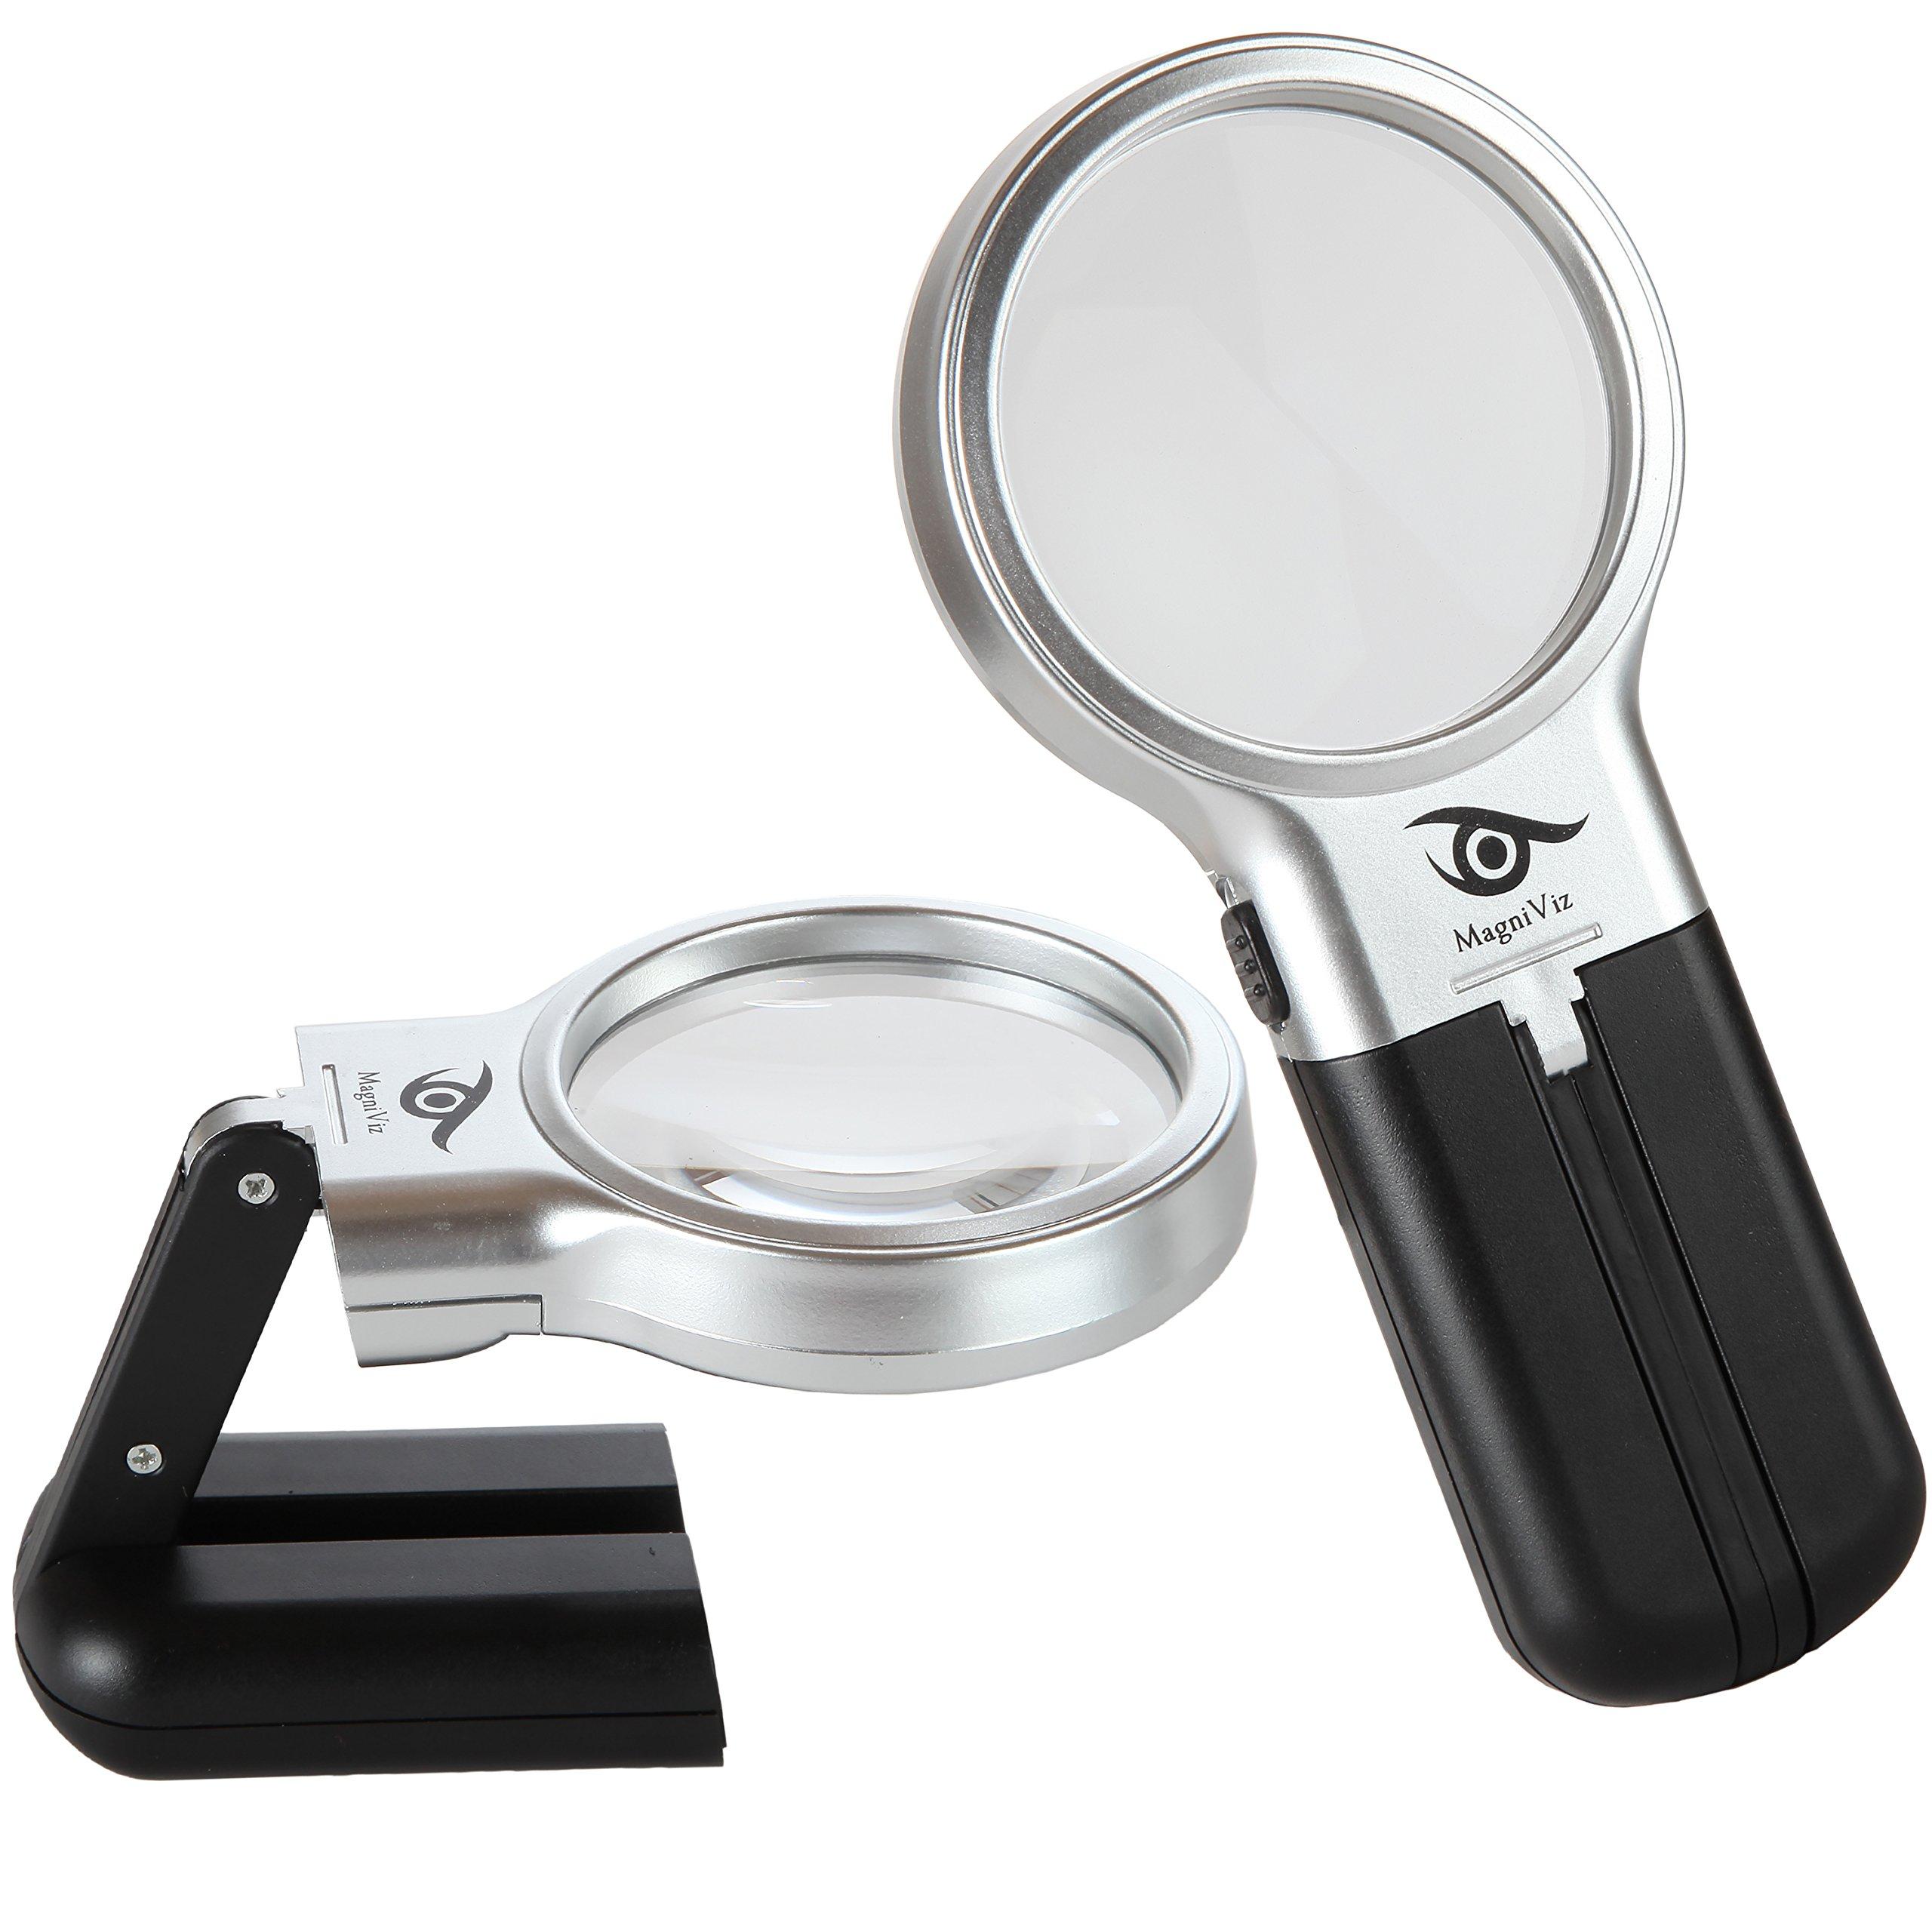 magniviz magnifying glass hobby craft magnifier with led. Black Bedroom Furniture Sets. Home Design Ideas